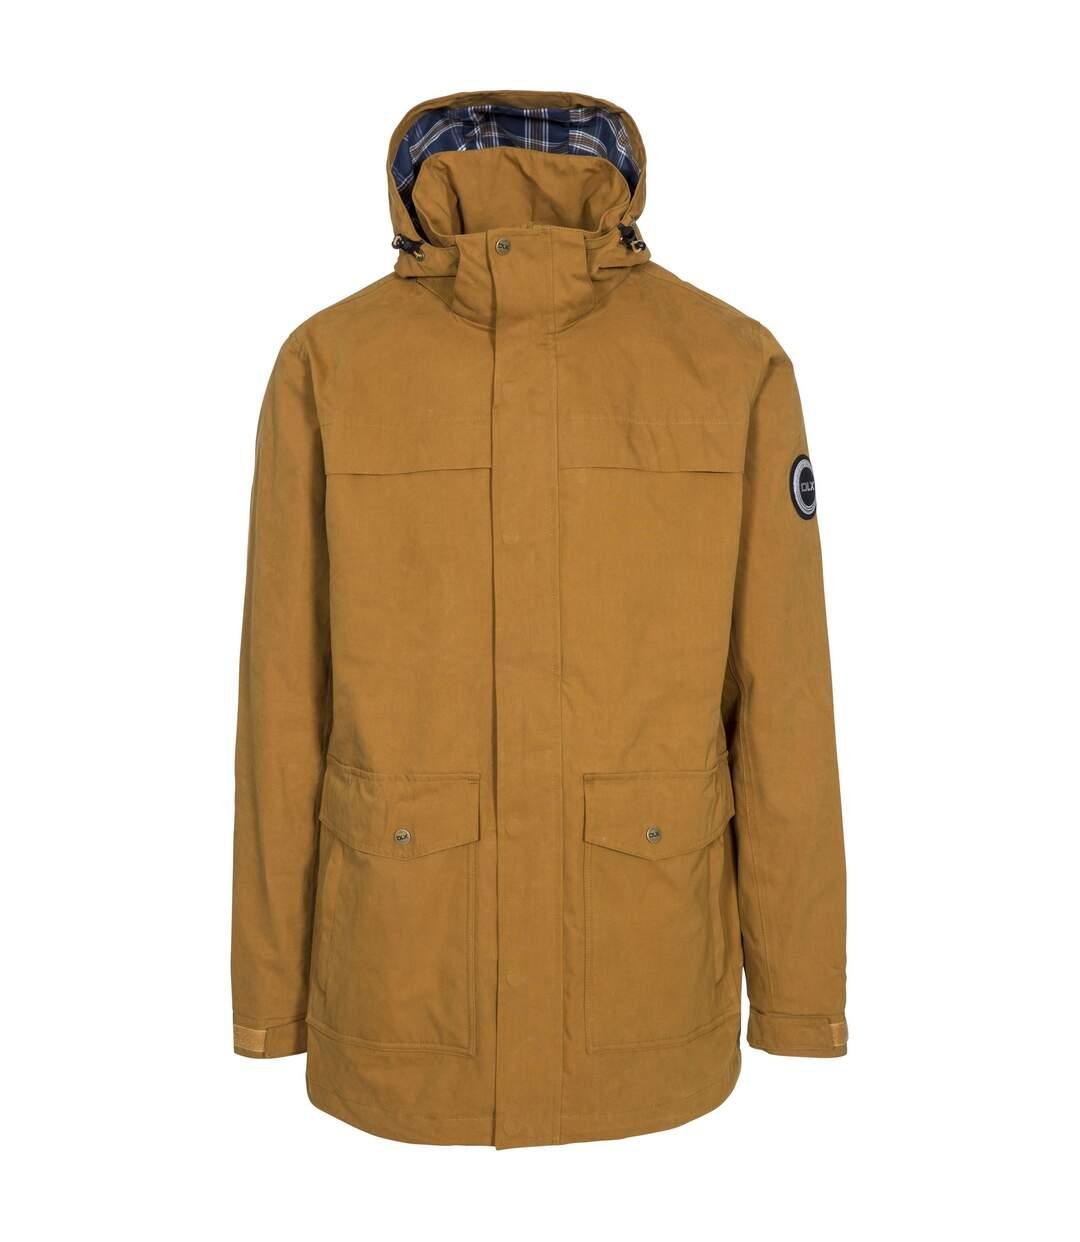 Trespass Mens Rowland Waterproof Jacket (Golden Brown) - UTTP4612